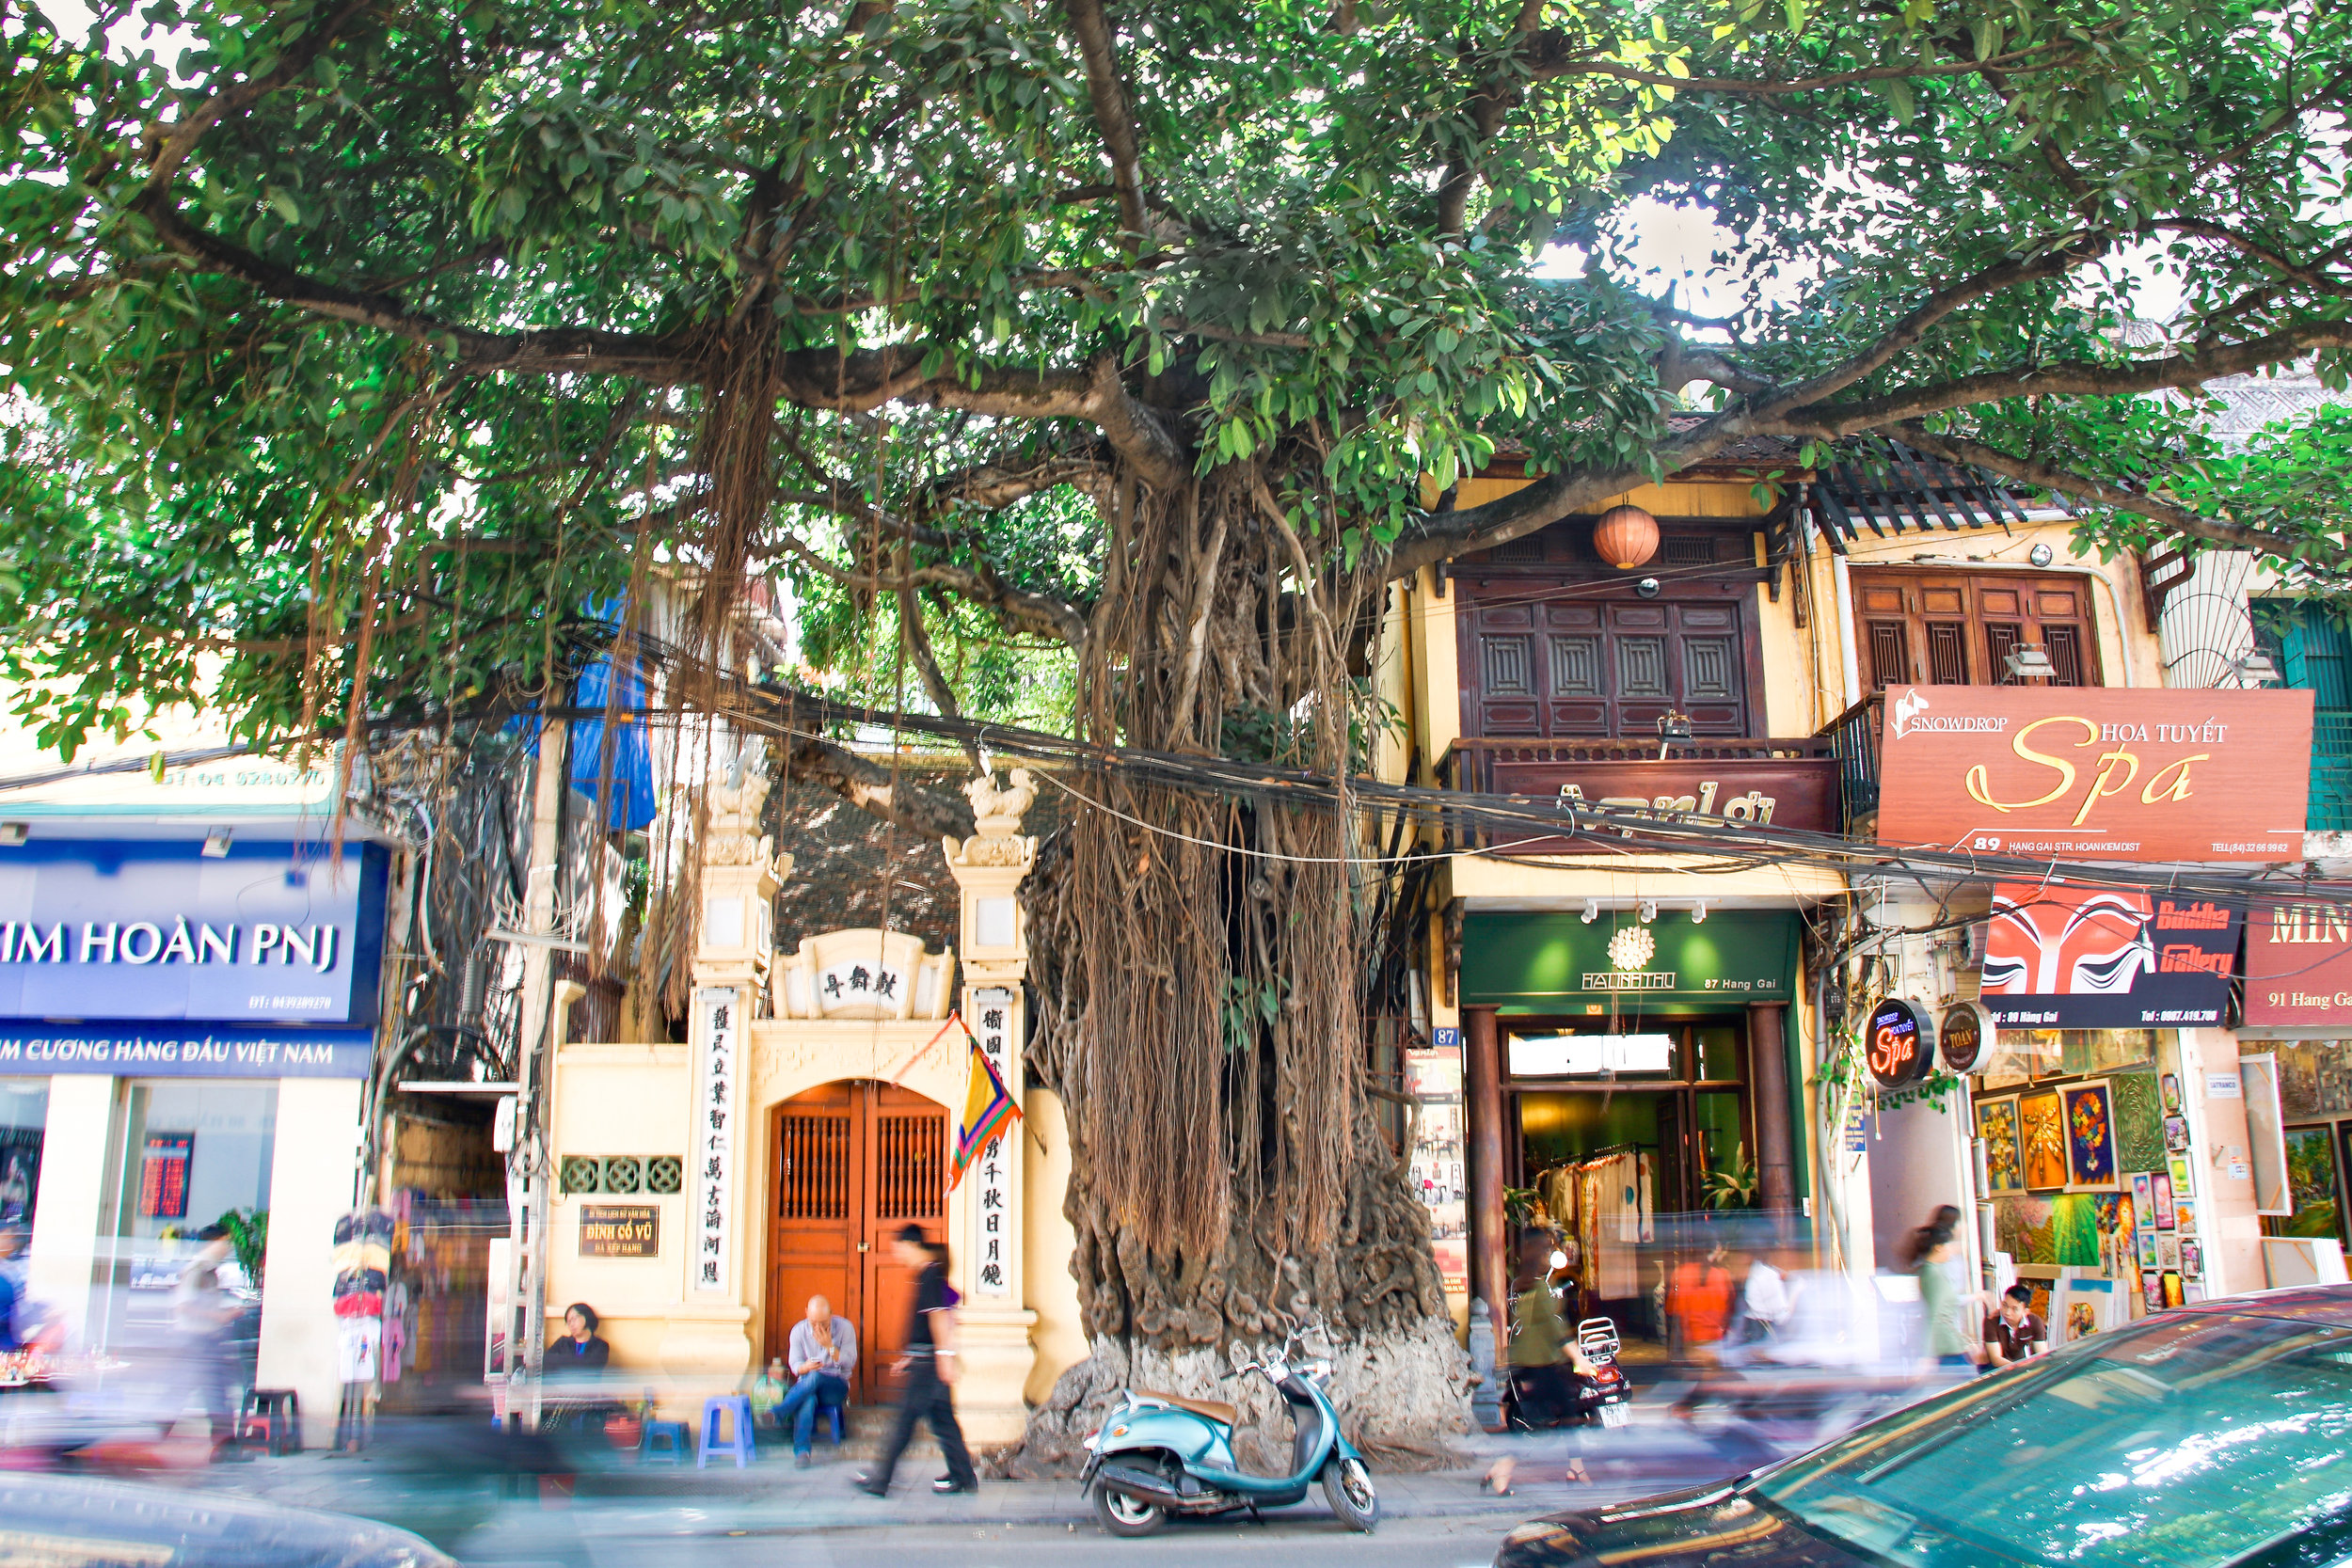 Big tree in Hanoi, Vietnam. Across Land & Sea